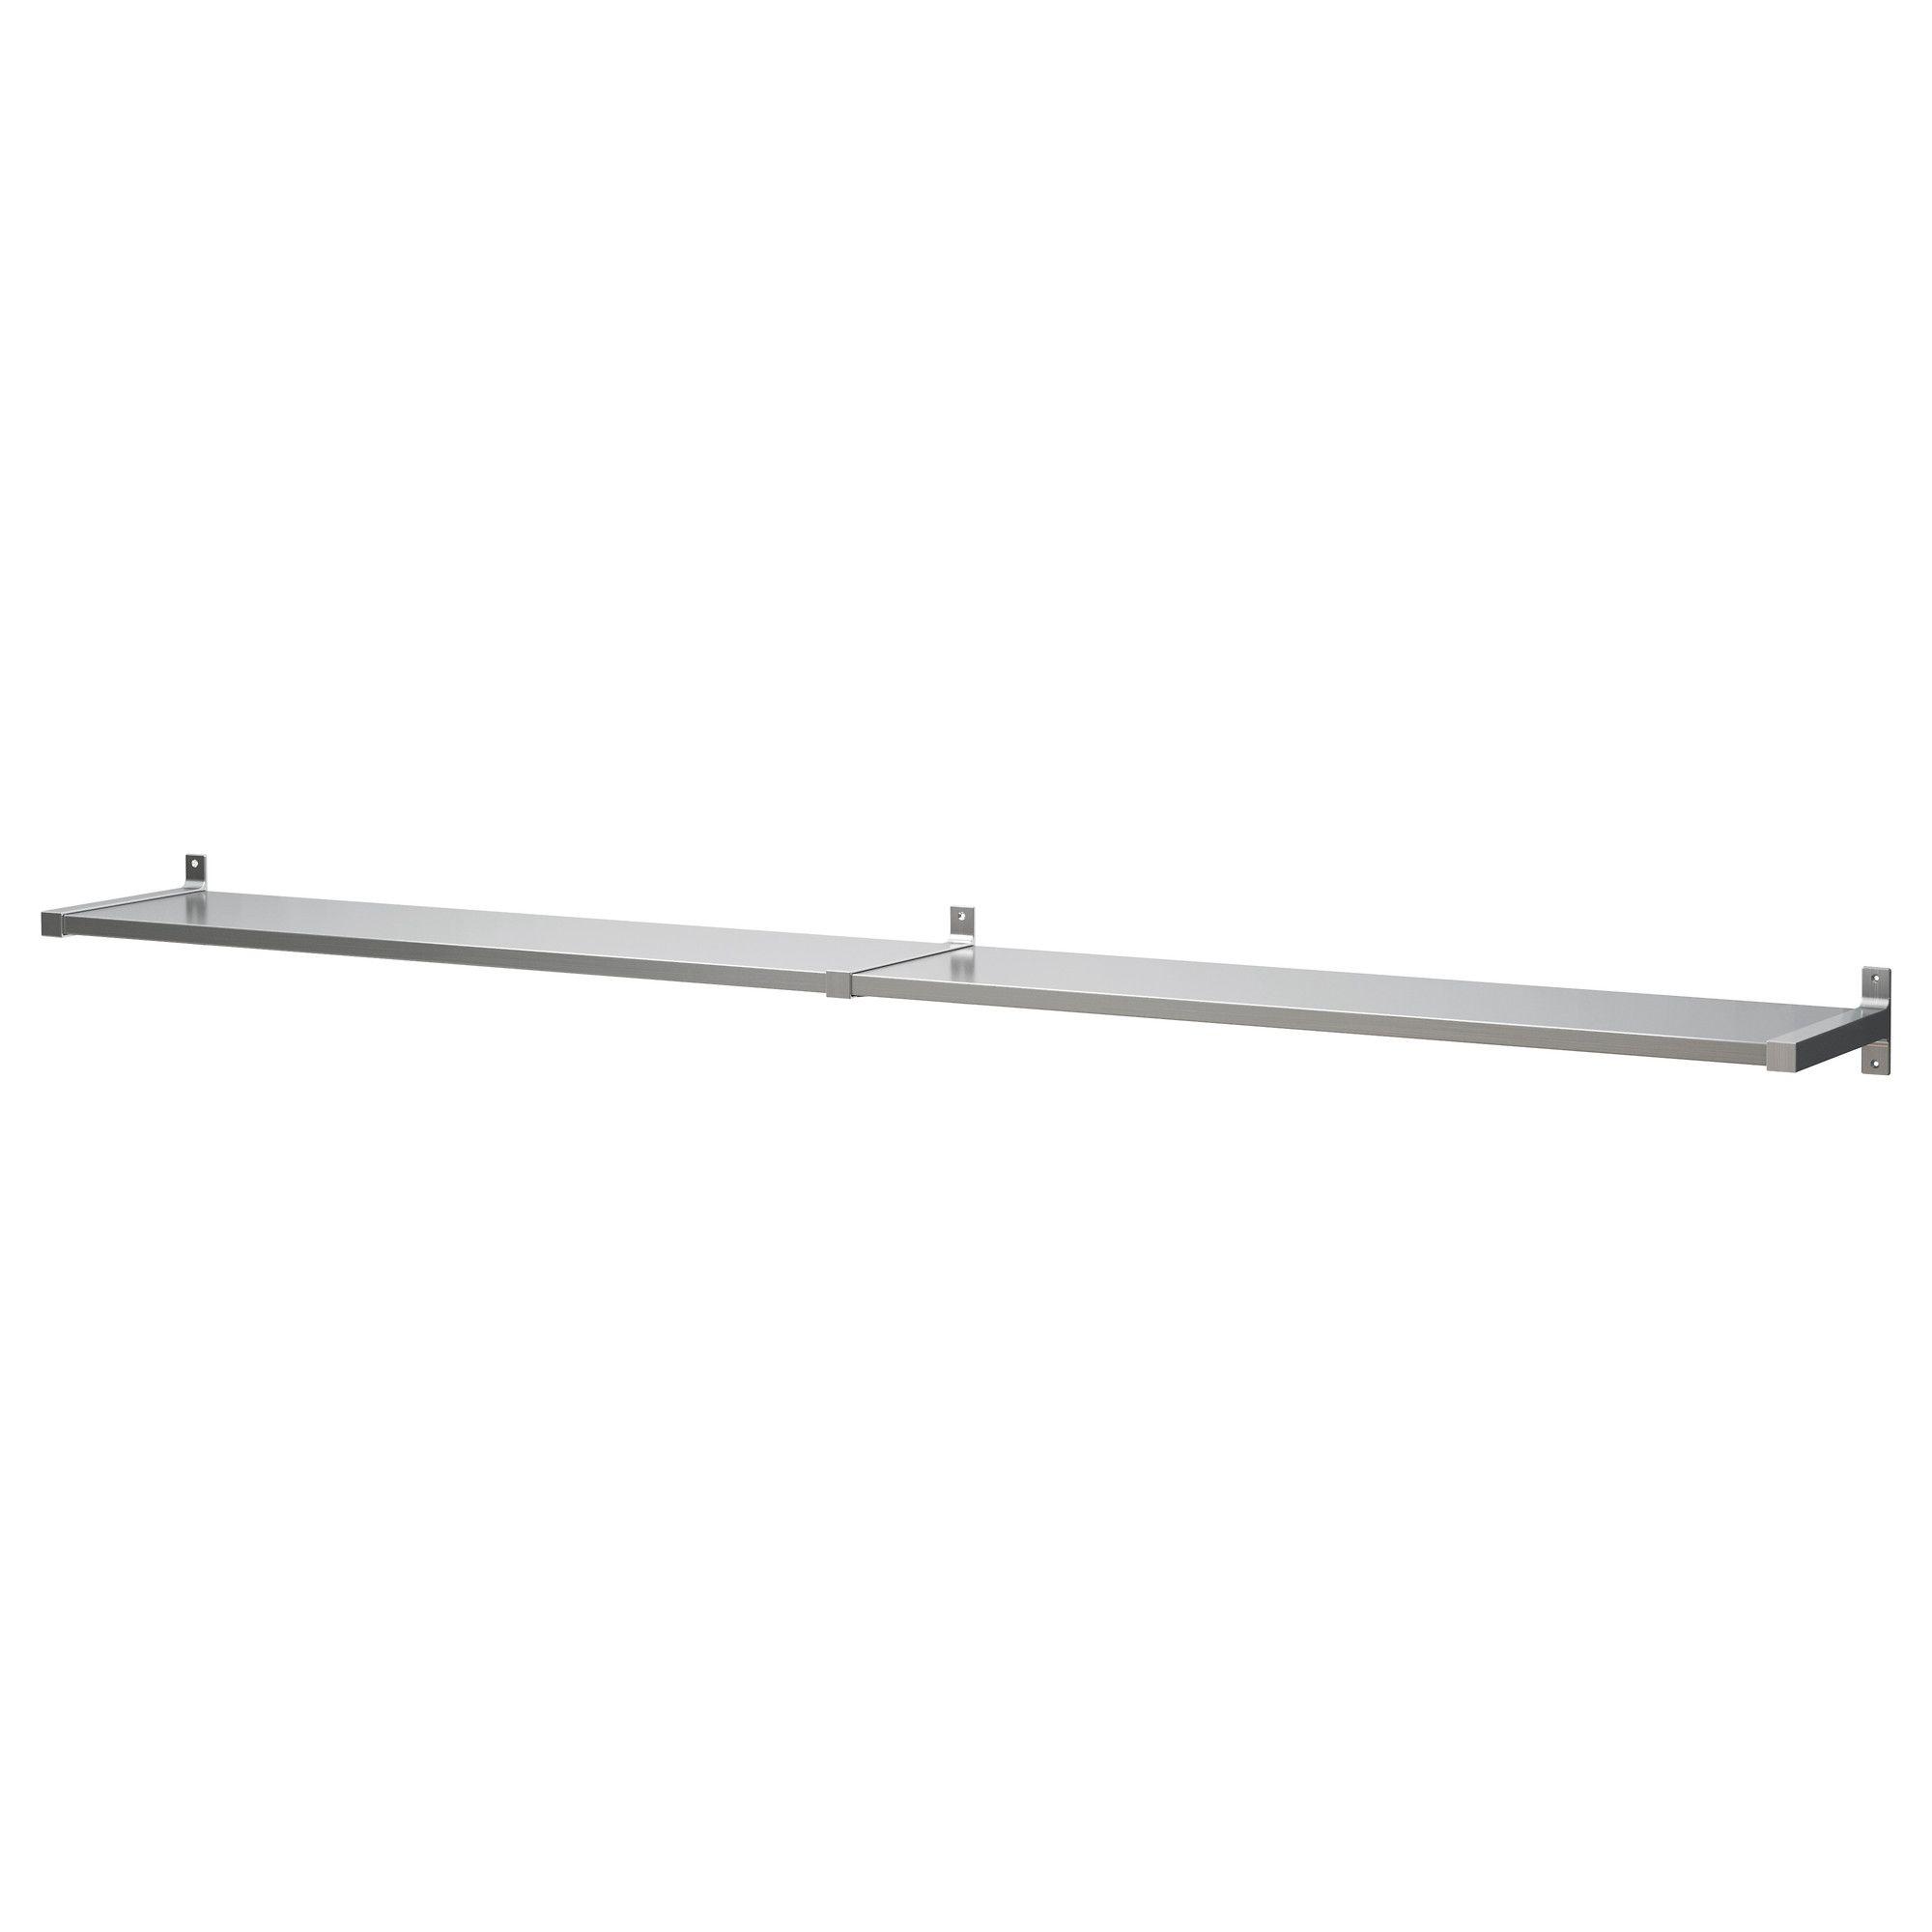 products cm on art space furniture bathroom shelf stainless grundtal ie storage en worktop wall steel saves ikea the